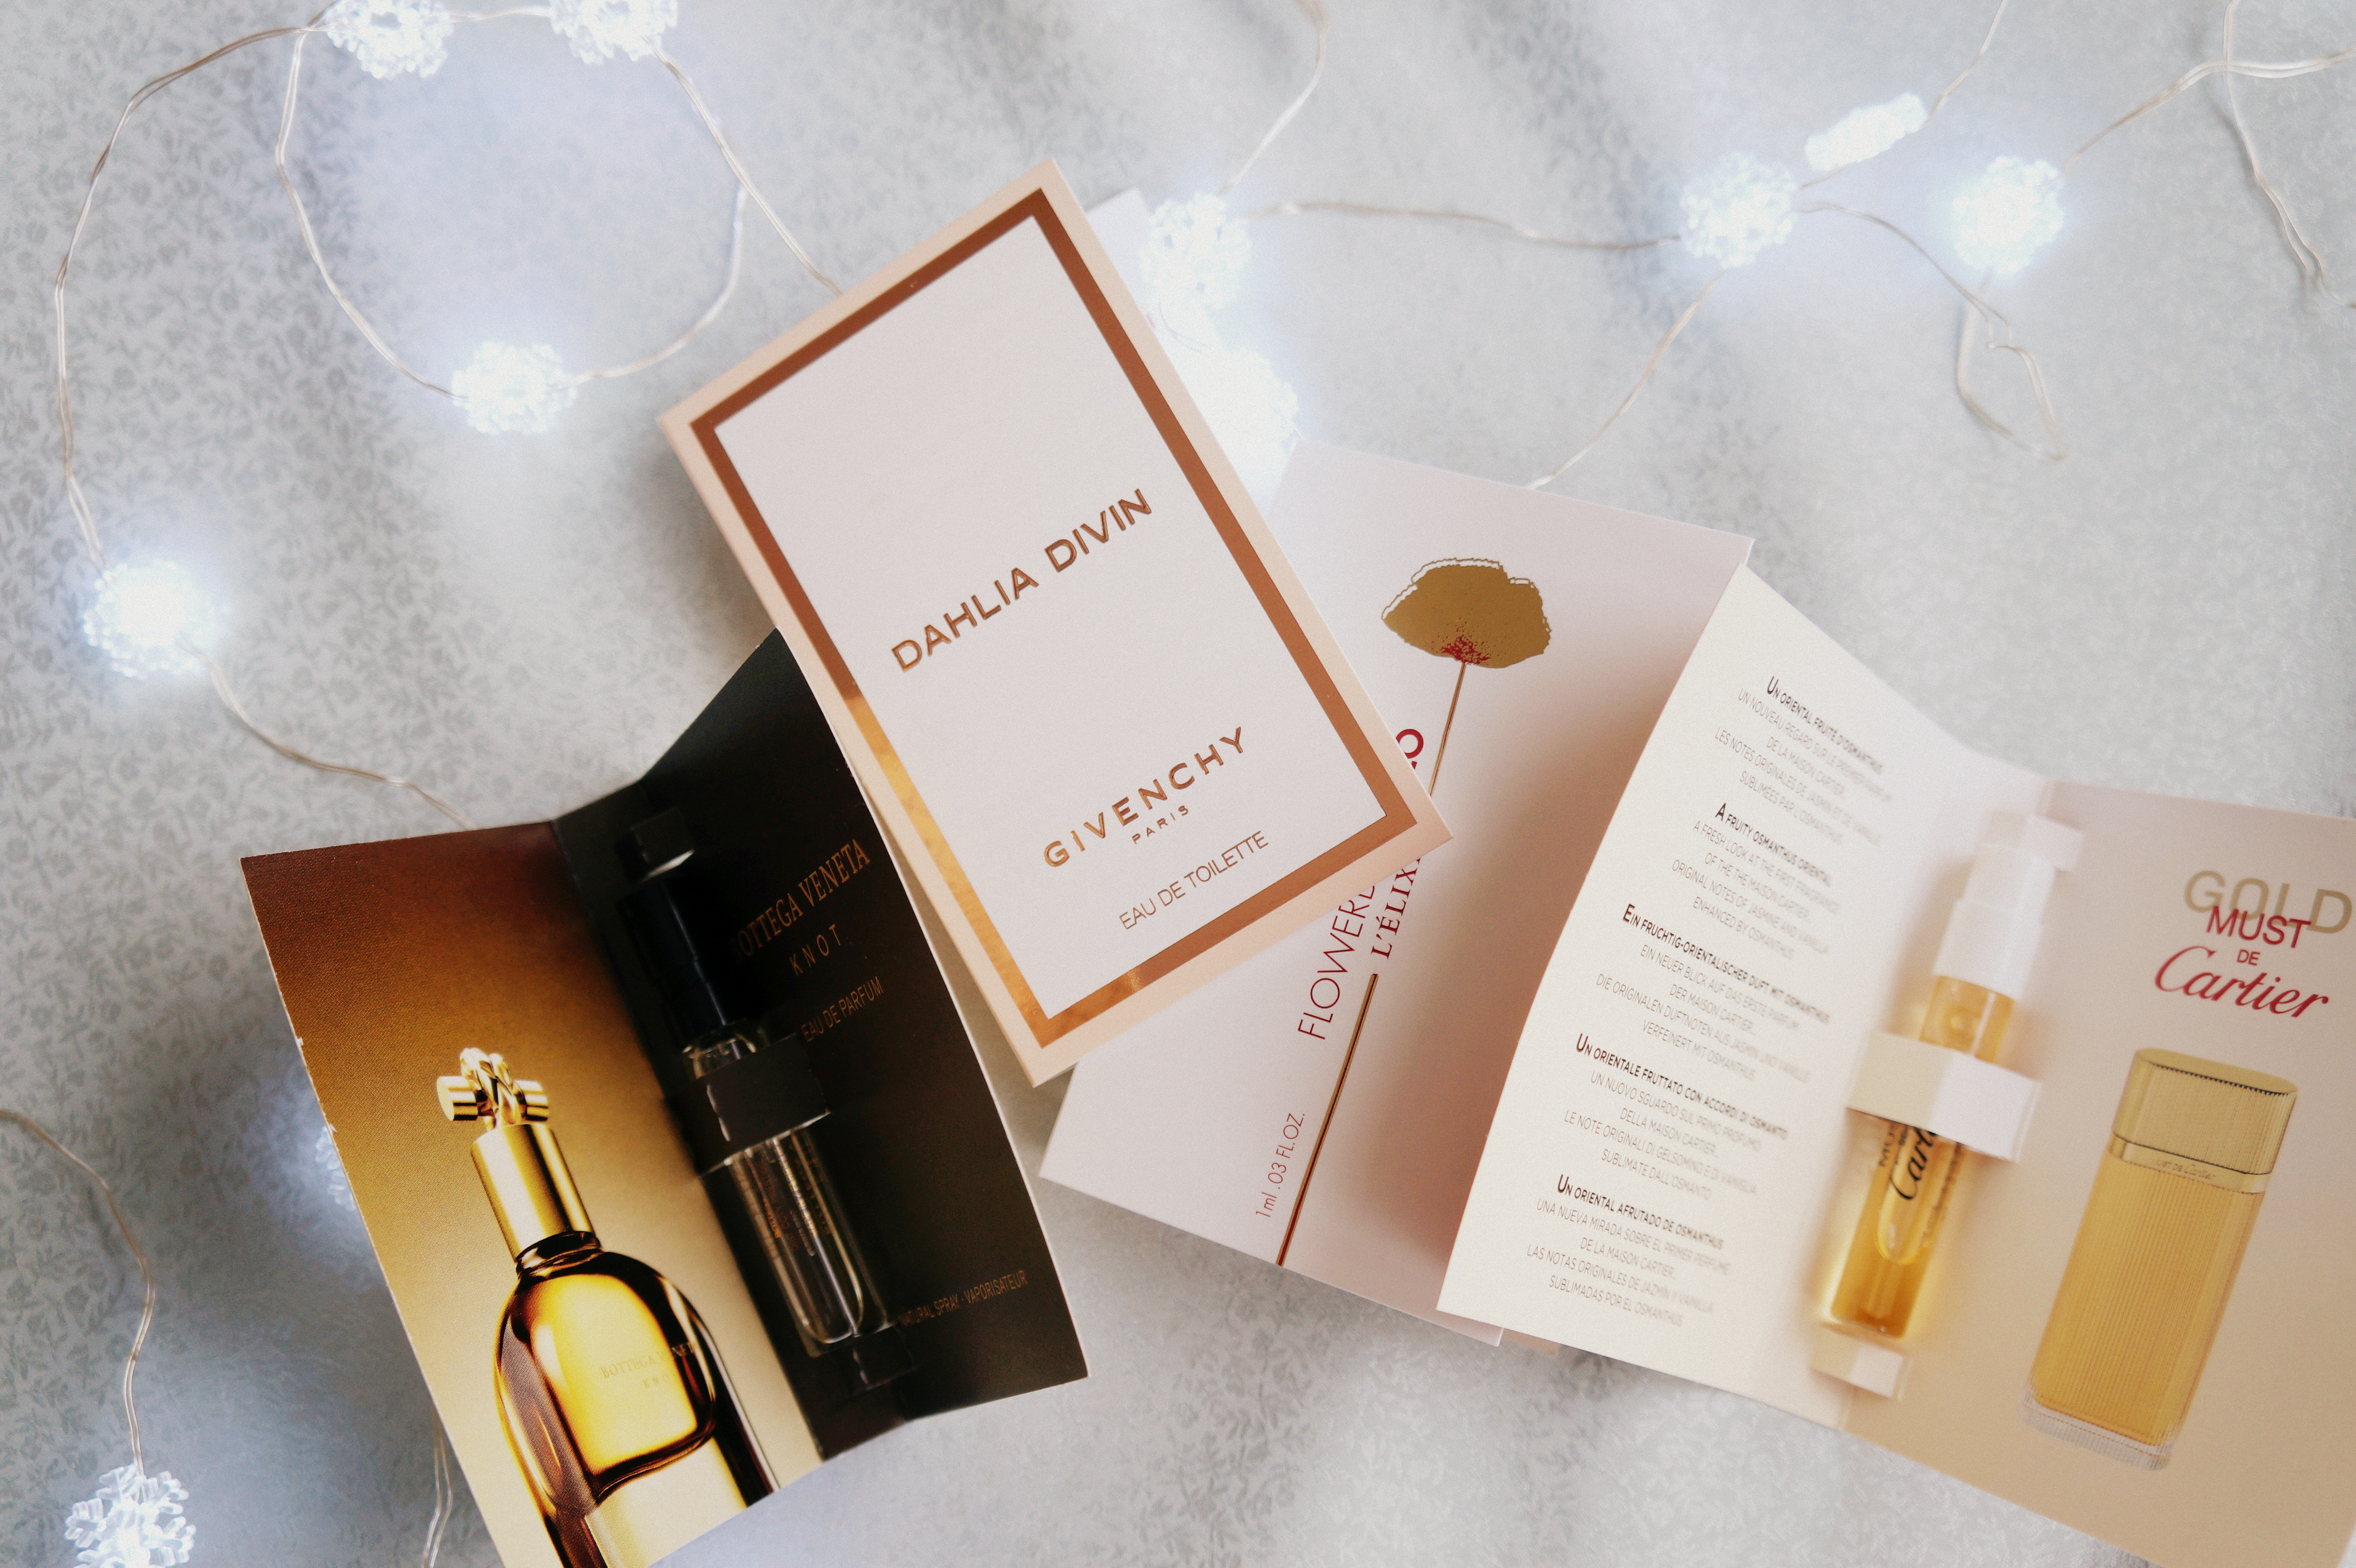 próbki-perfum-edpholiczka-kenzo-givenchy